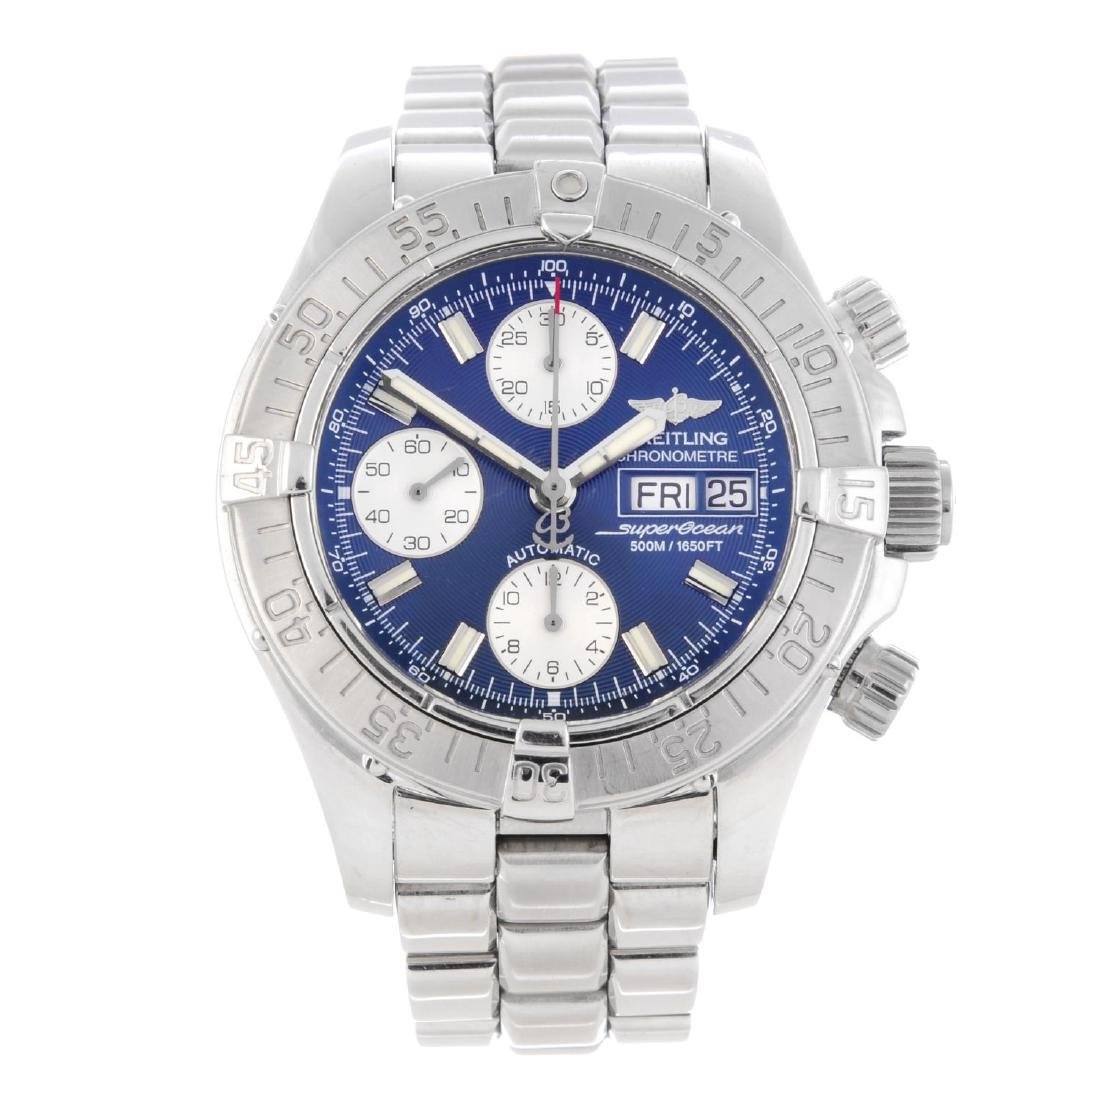 BREITLING - a gentleman's SuperOcean chronograph